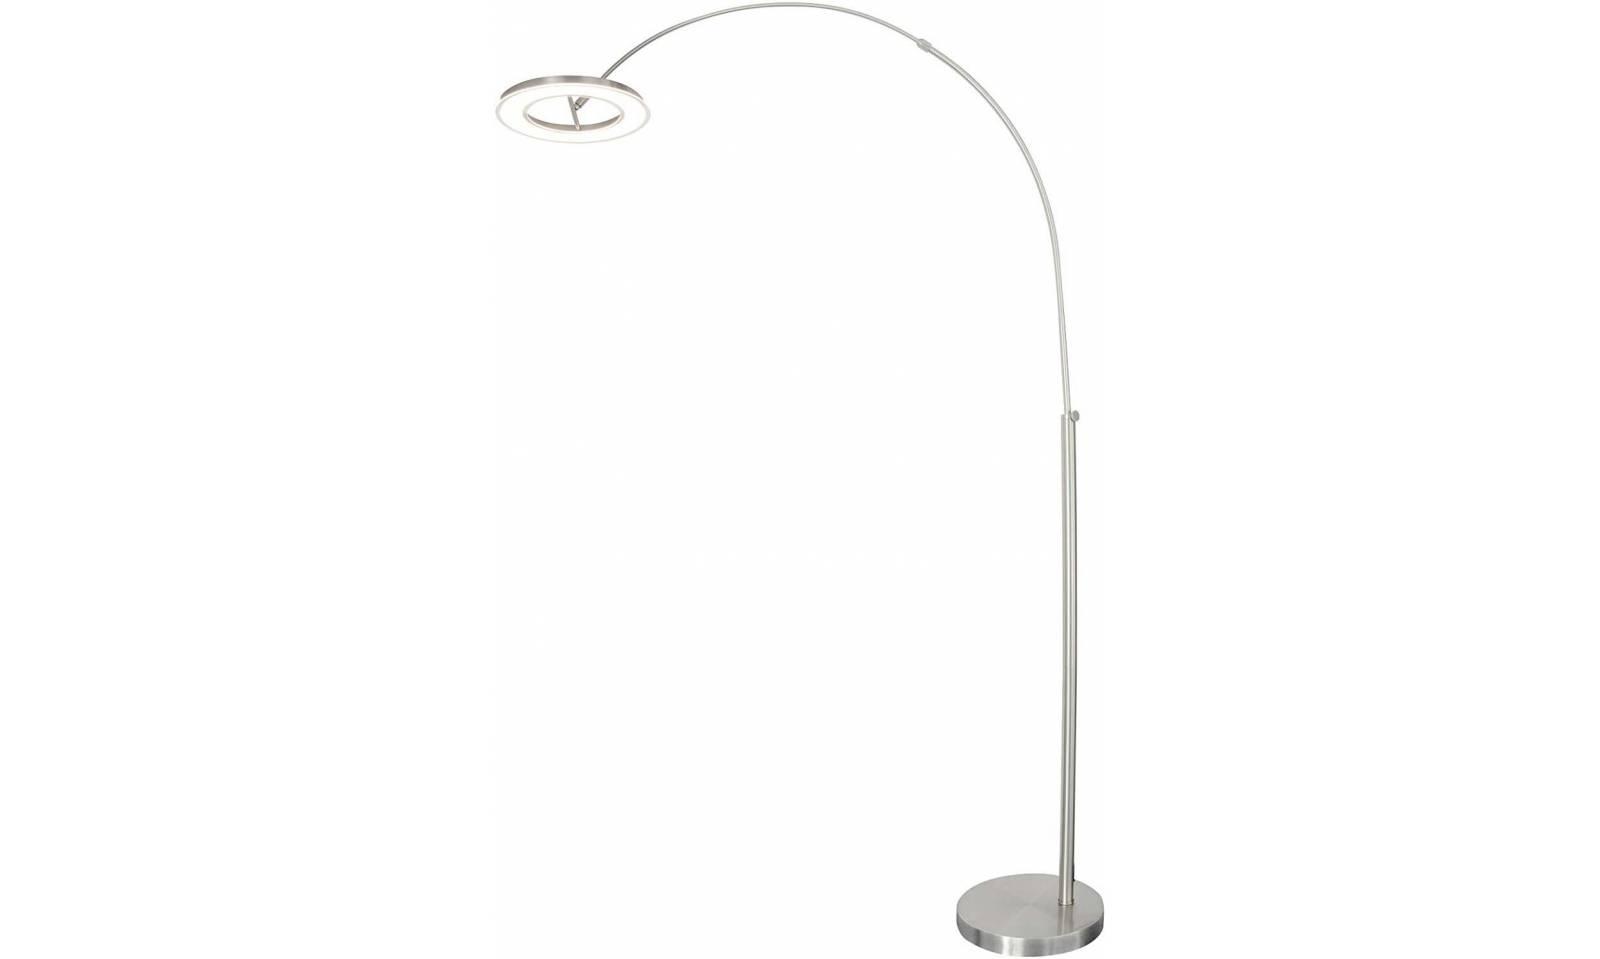 Moder Eled Stehlampe Ra Mimax Lighting